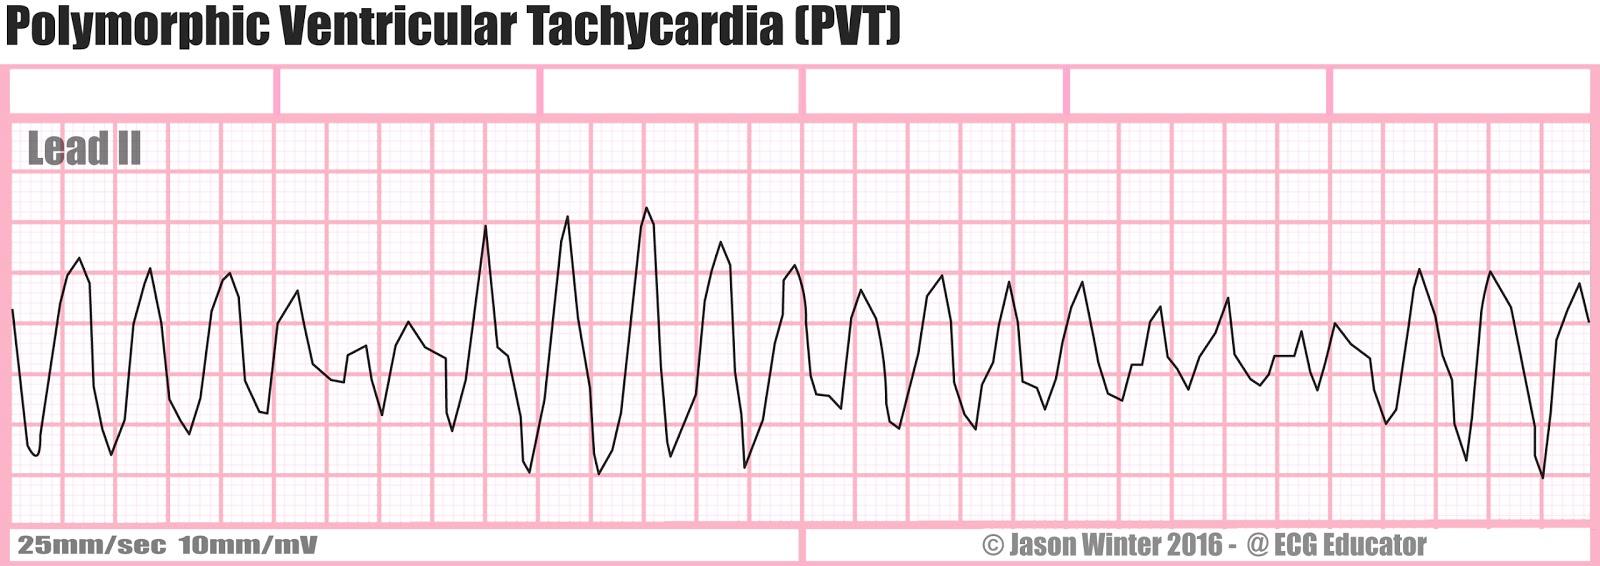 ECG Educator Blog : Polymorphic Ventricular Tachycardia (PVT) Ventricular Tachycardia Rhythm Strip